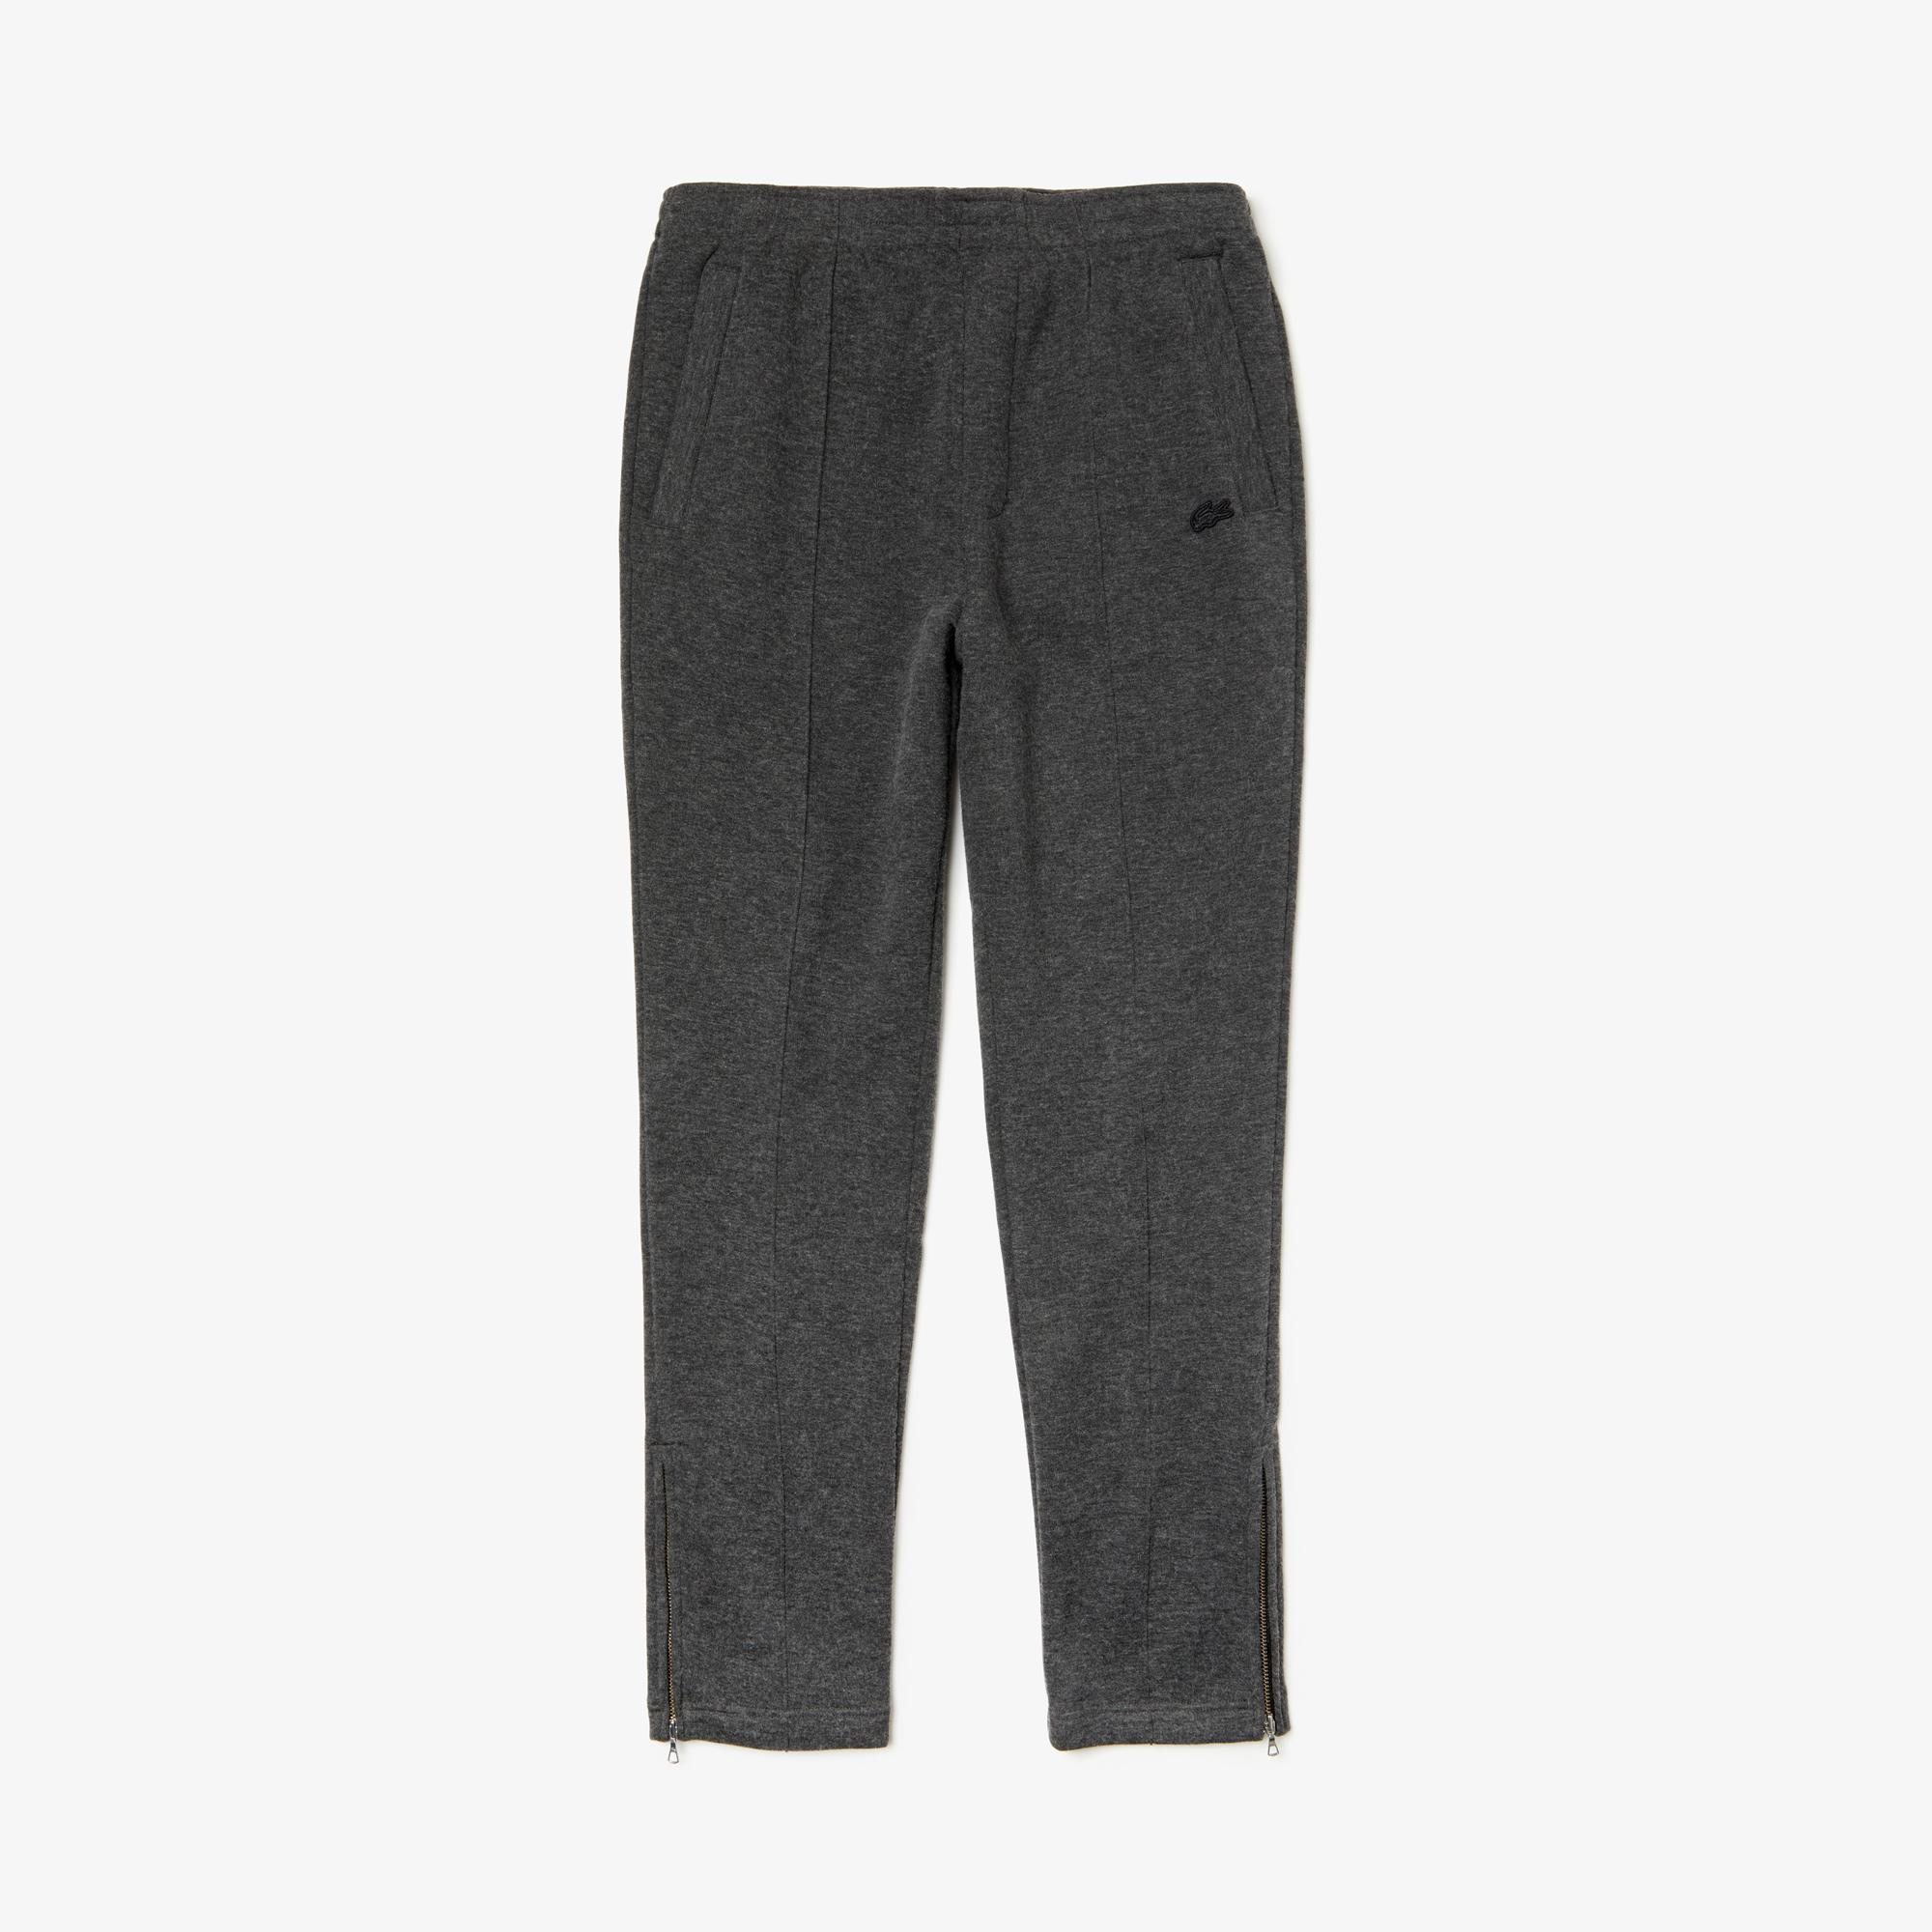 Lacoste Men's Cotton And Wool Blend Fleece Sweatpants